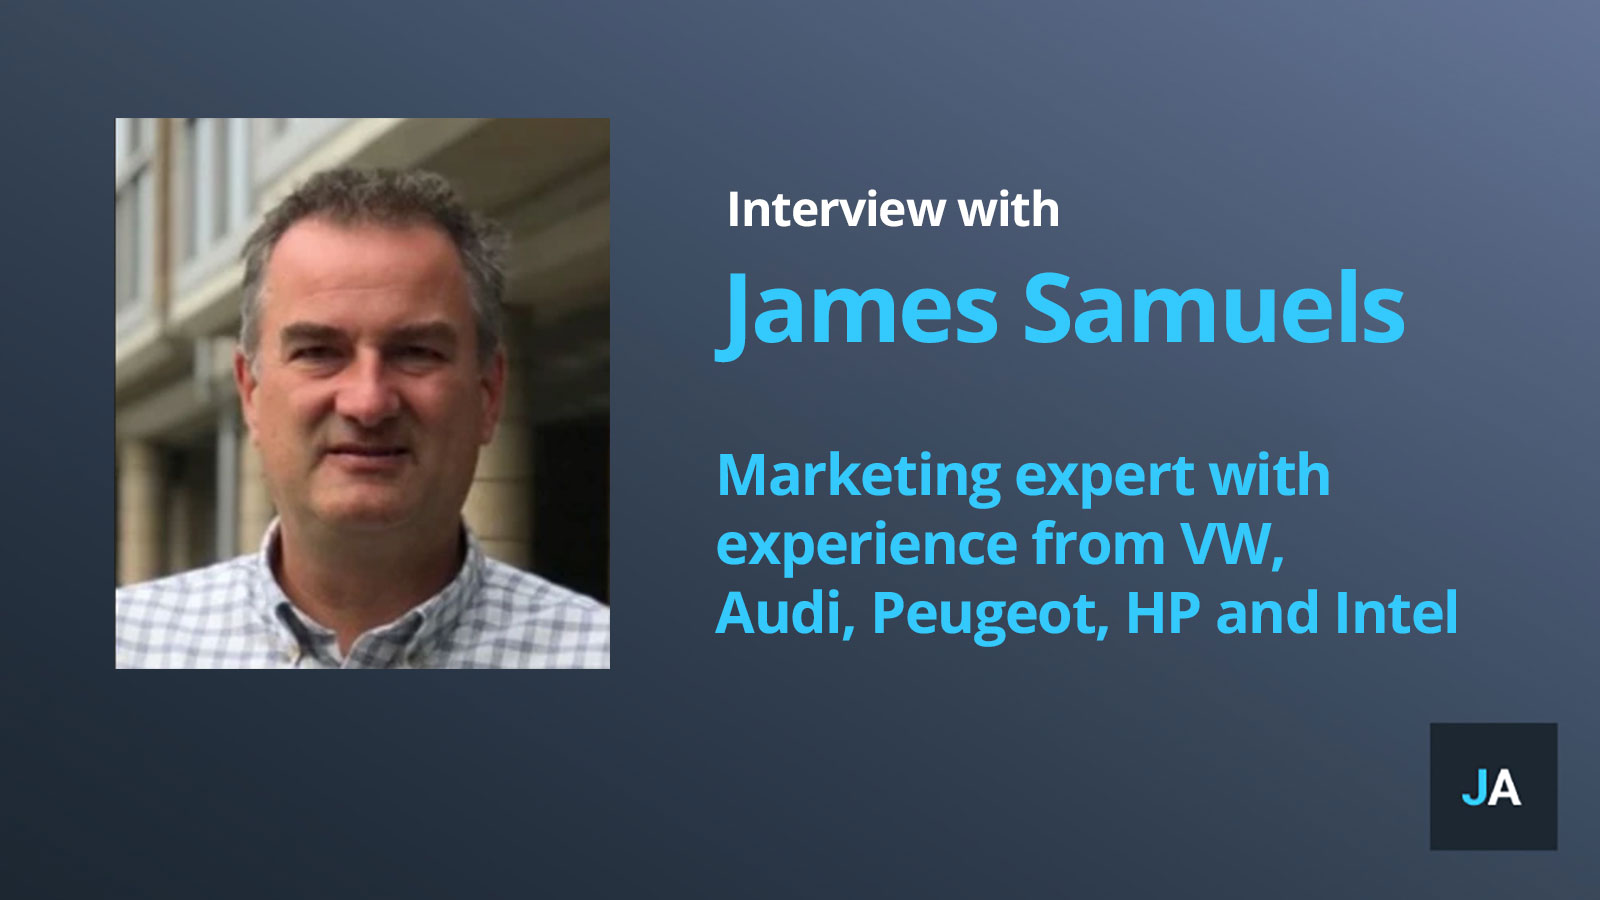 james samuels interview